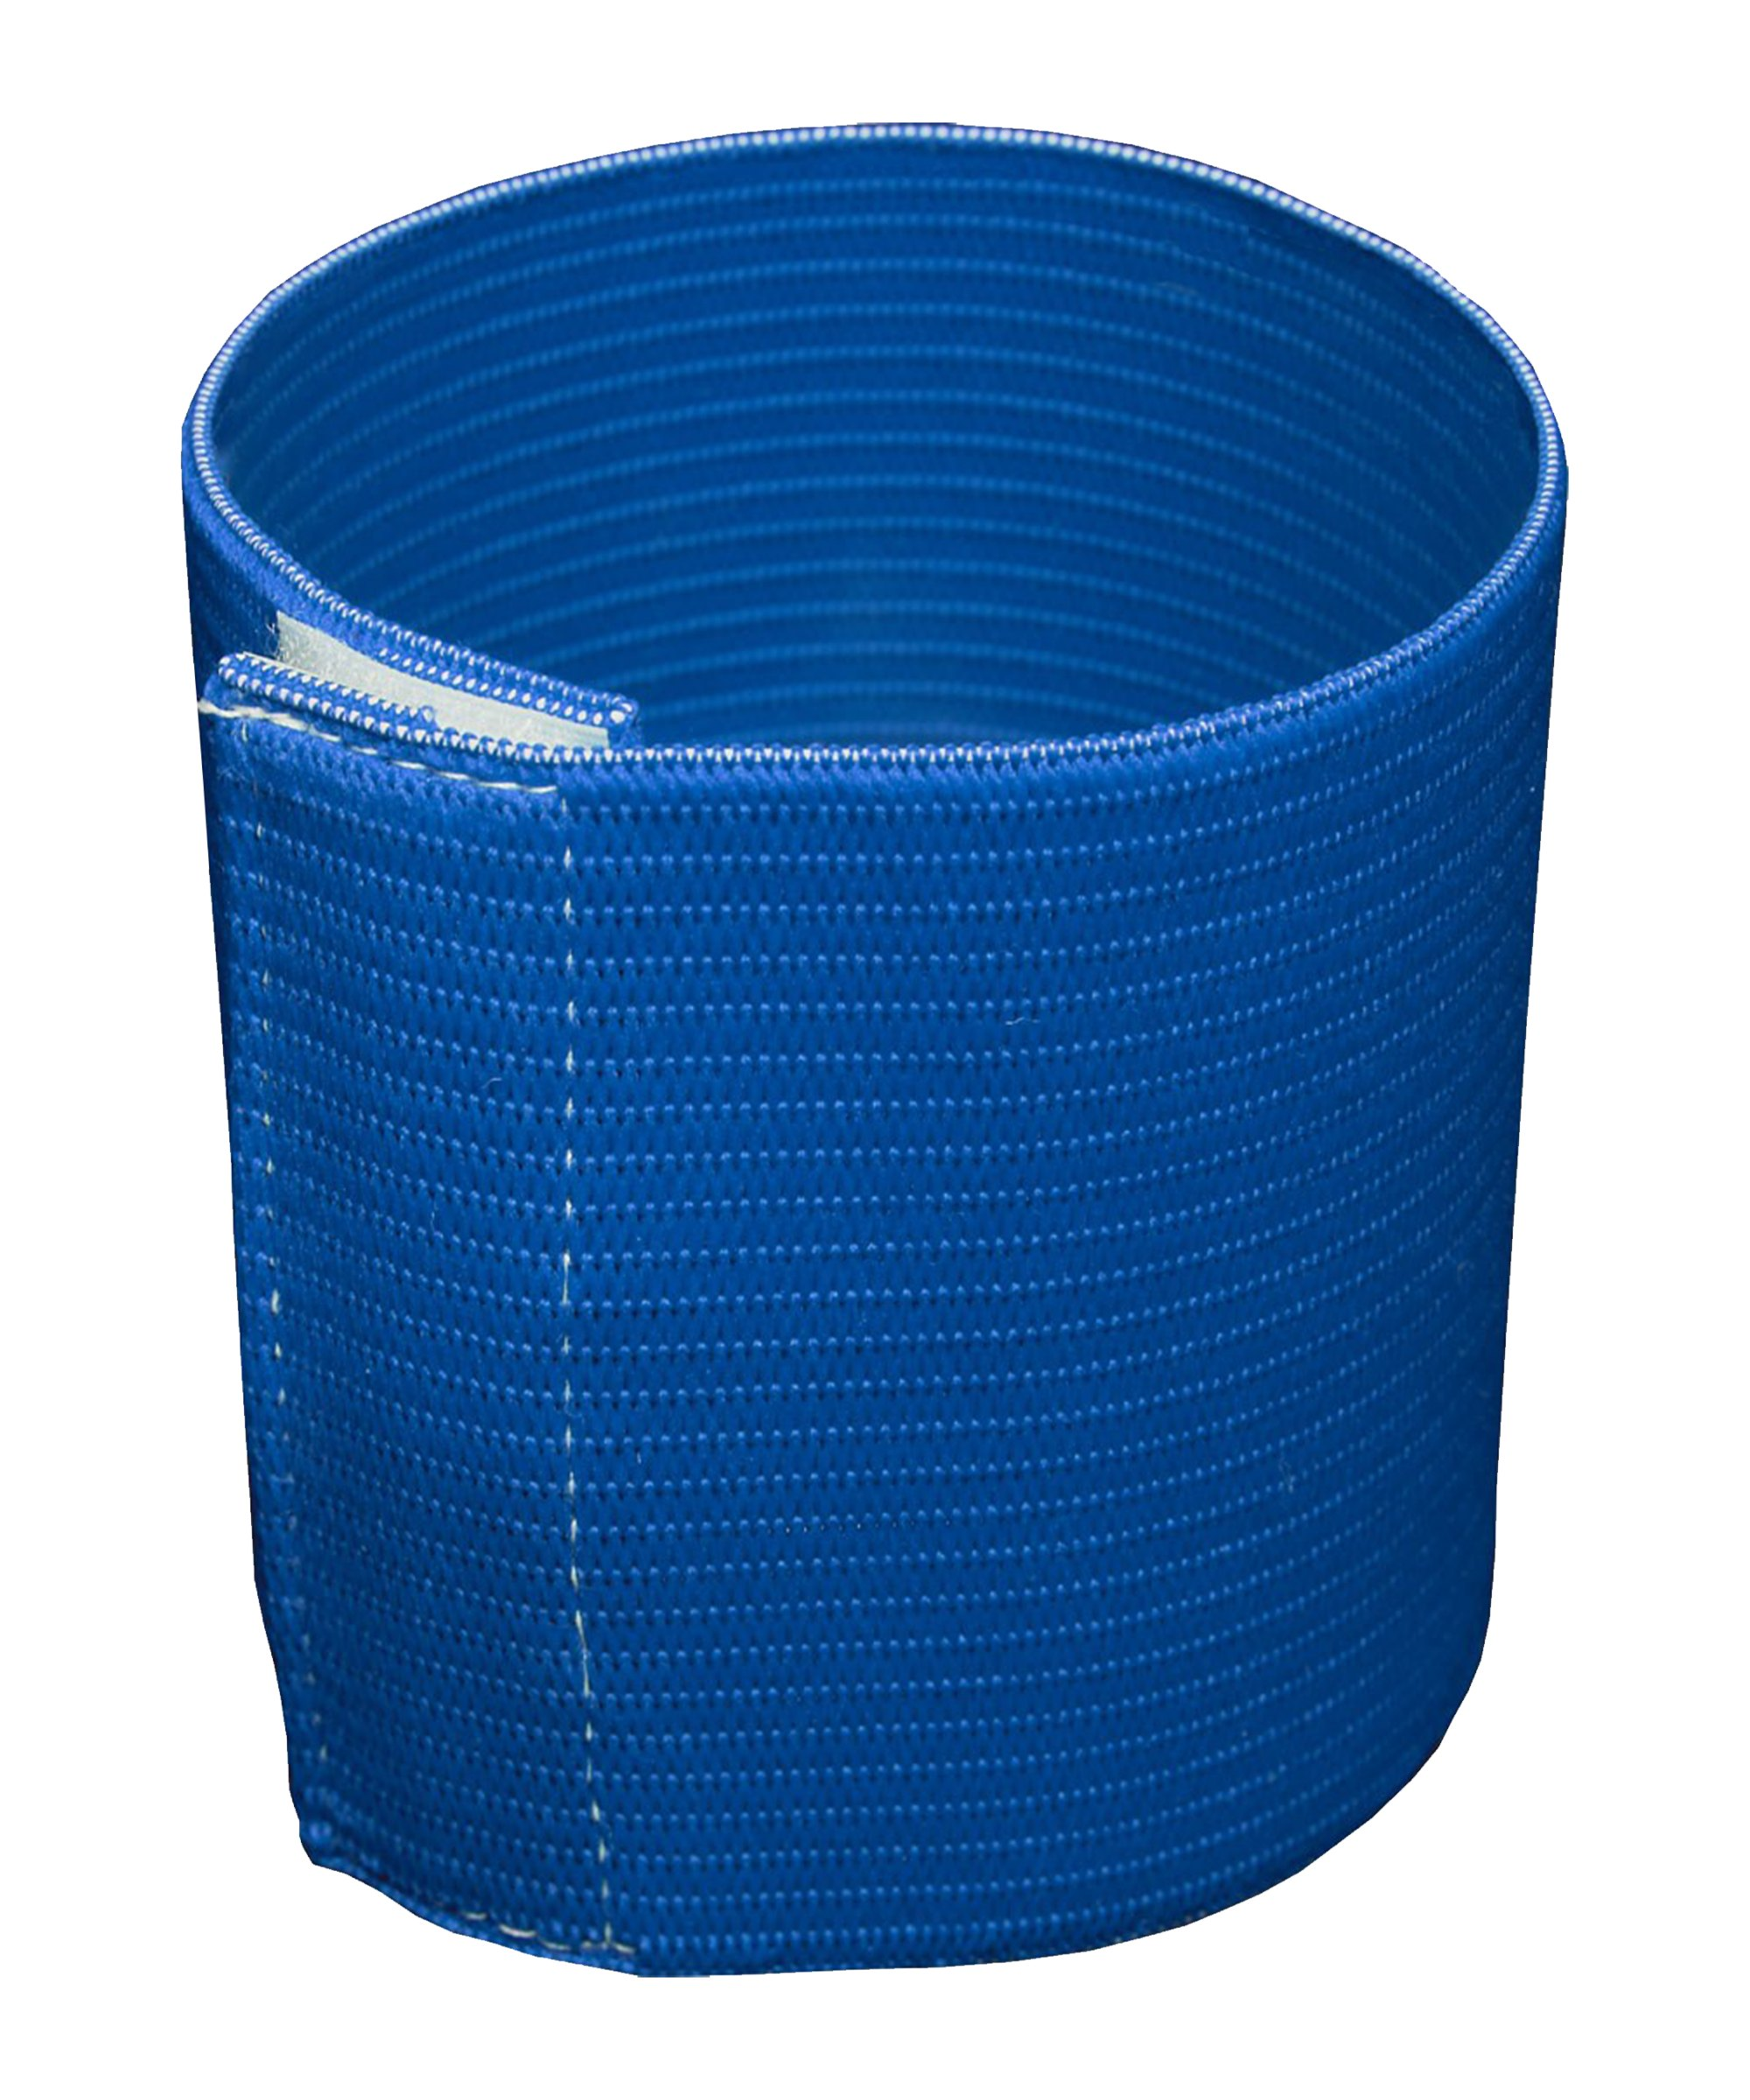 Cawila PRO UNI Armbinde Senior Blau - blau